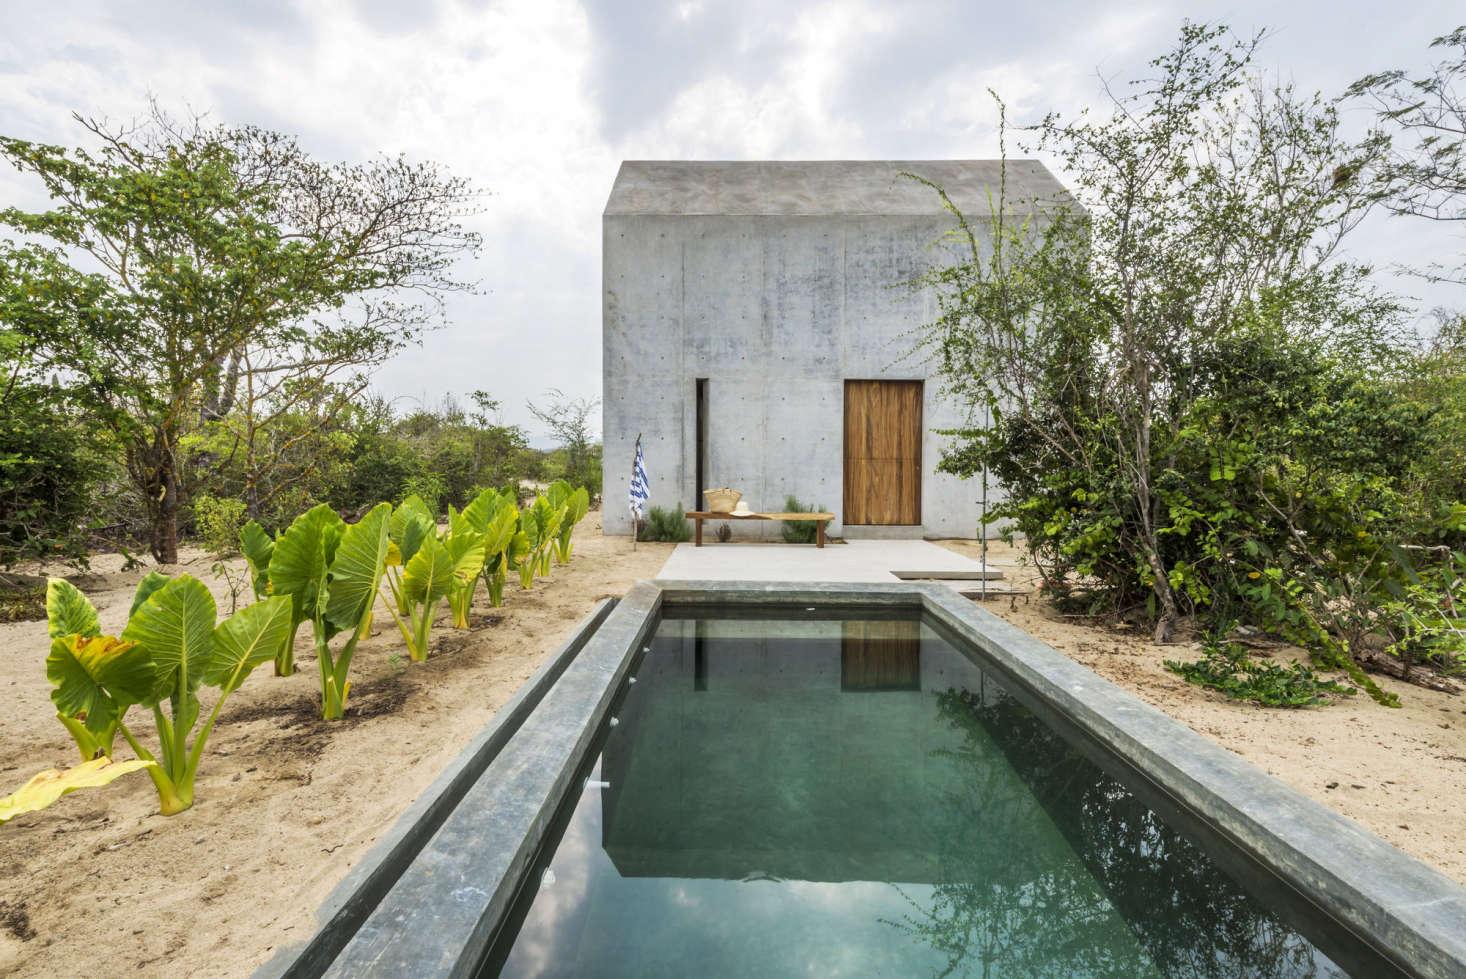 Casa Tiny, a Walden-Inspired Getaway in Mexico